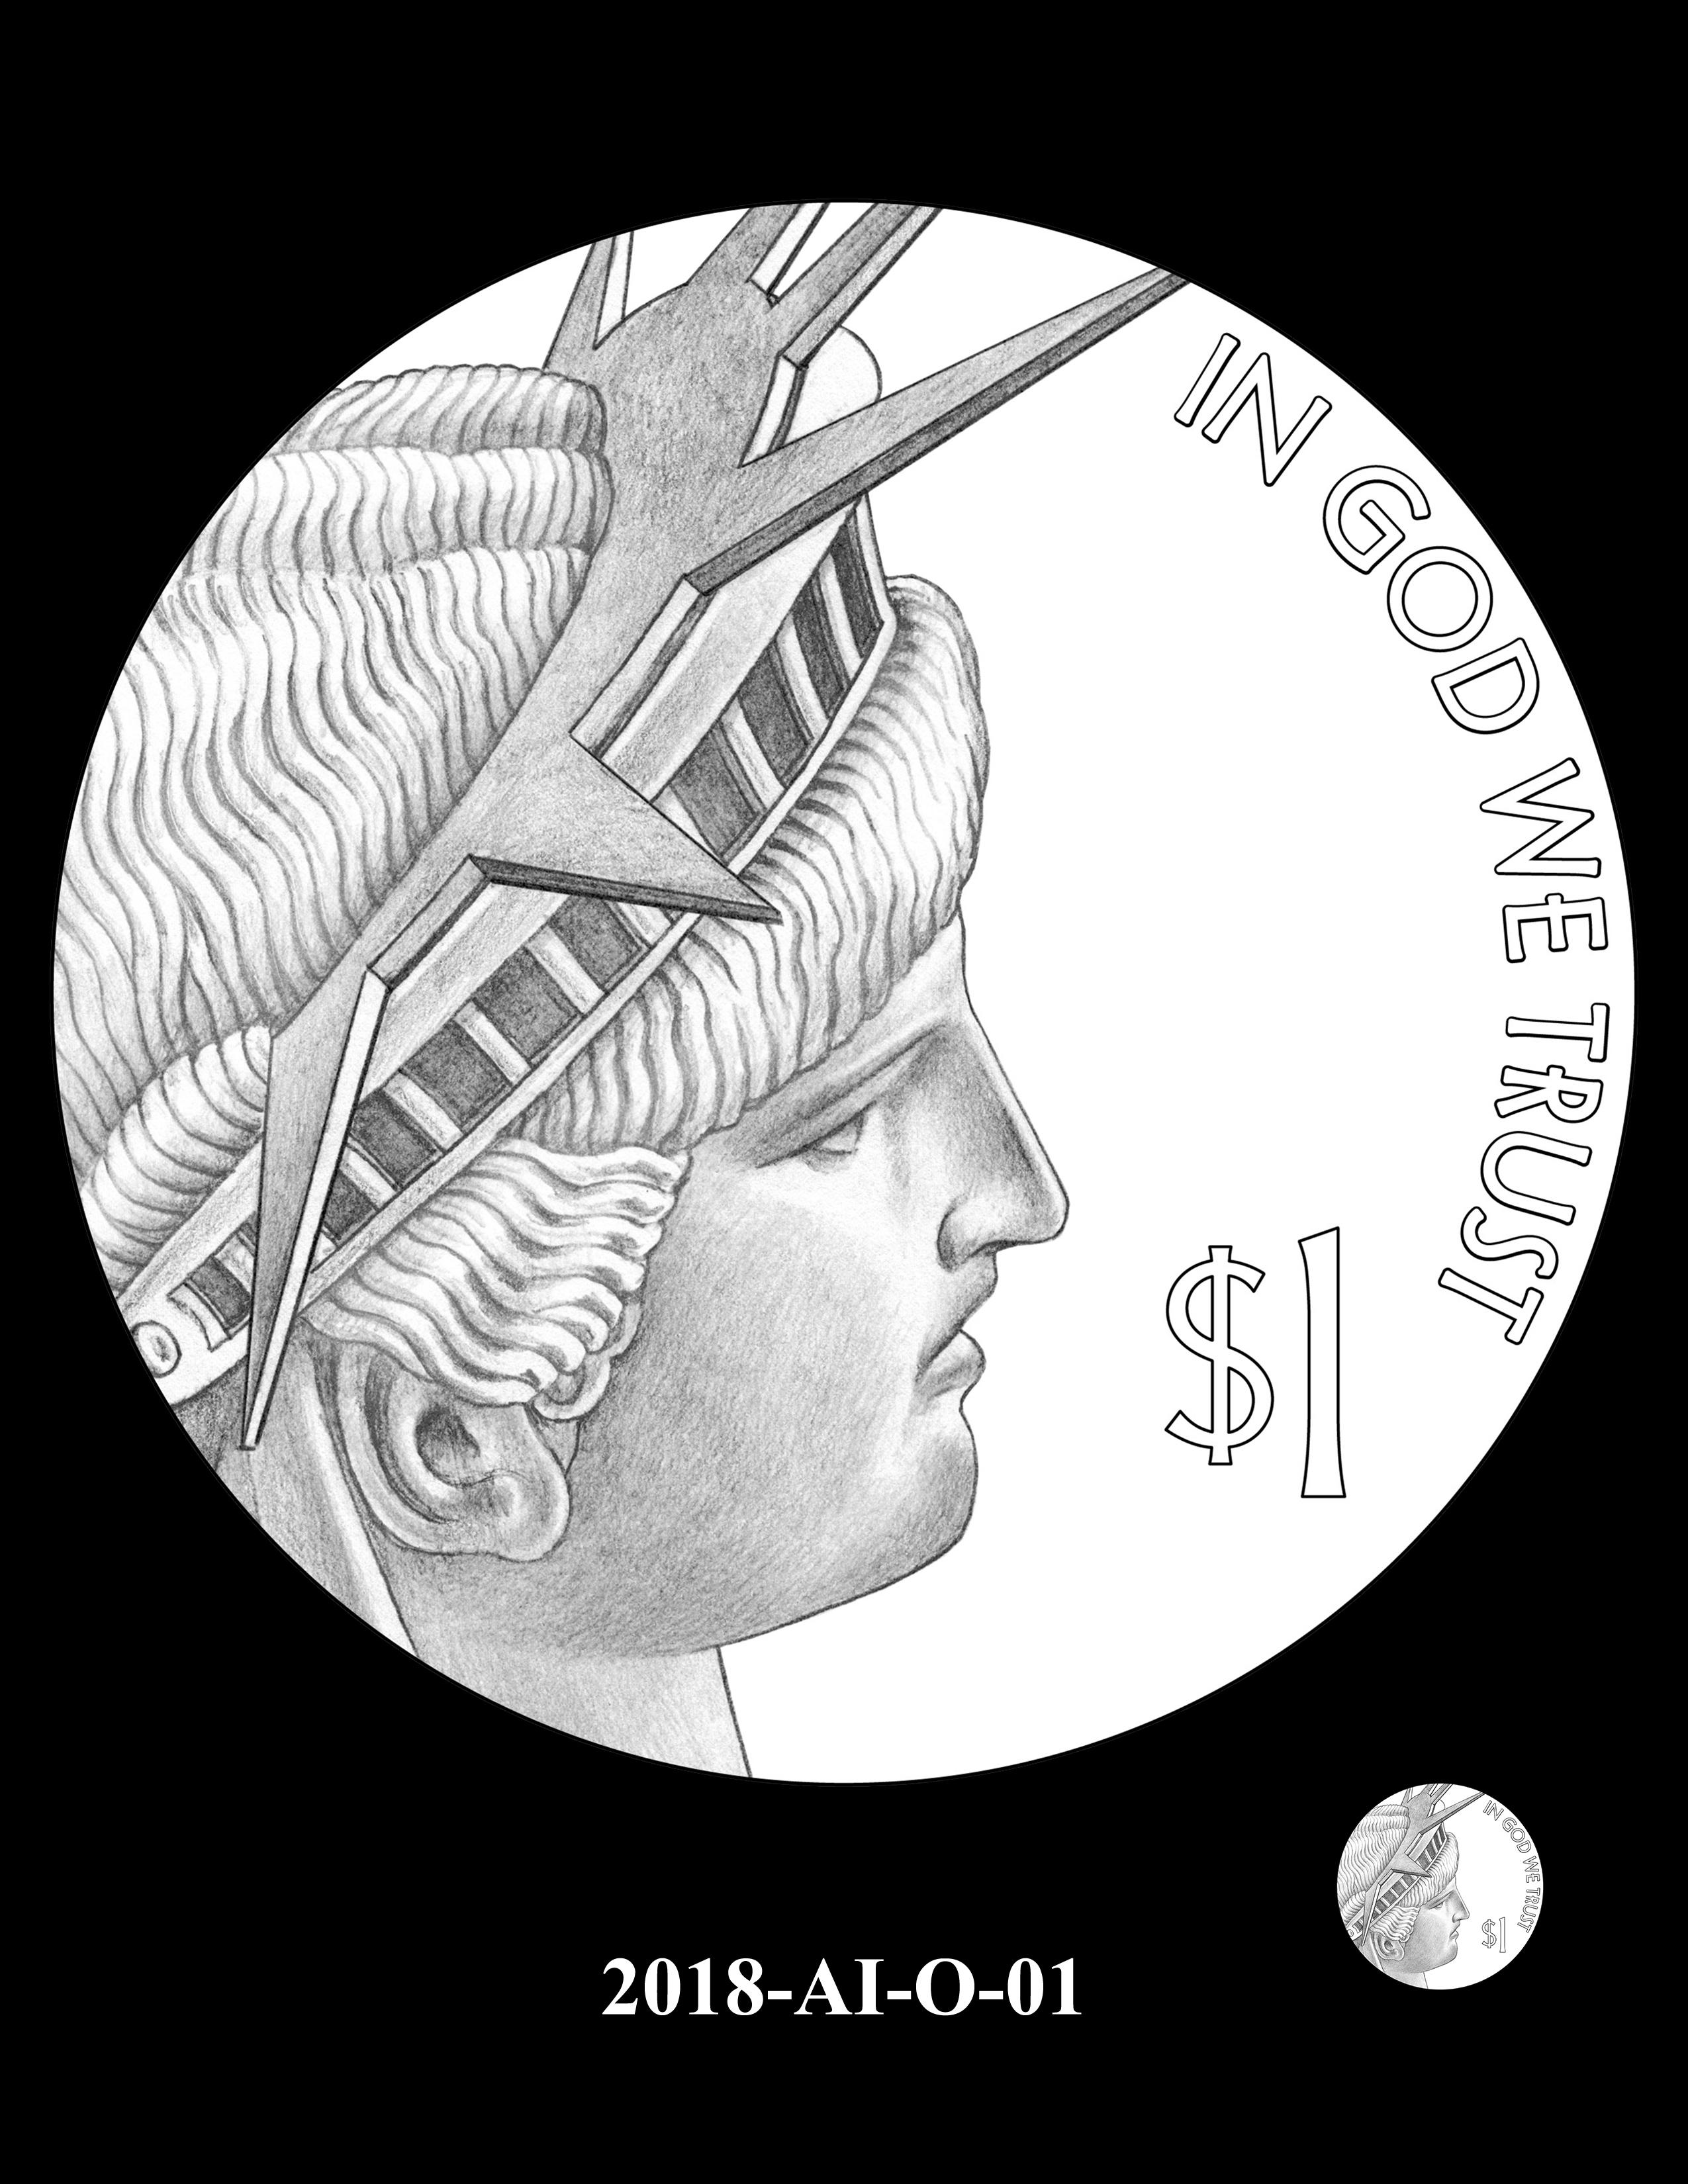 2018-AI-O-01 -- 2018 American Innovation $1 Coin